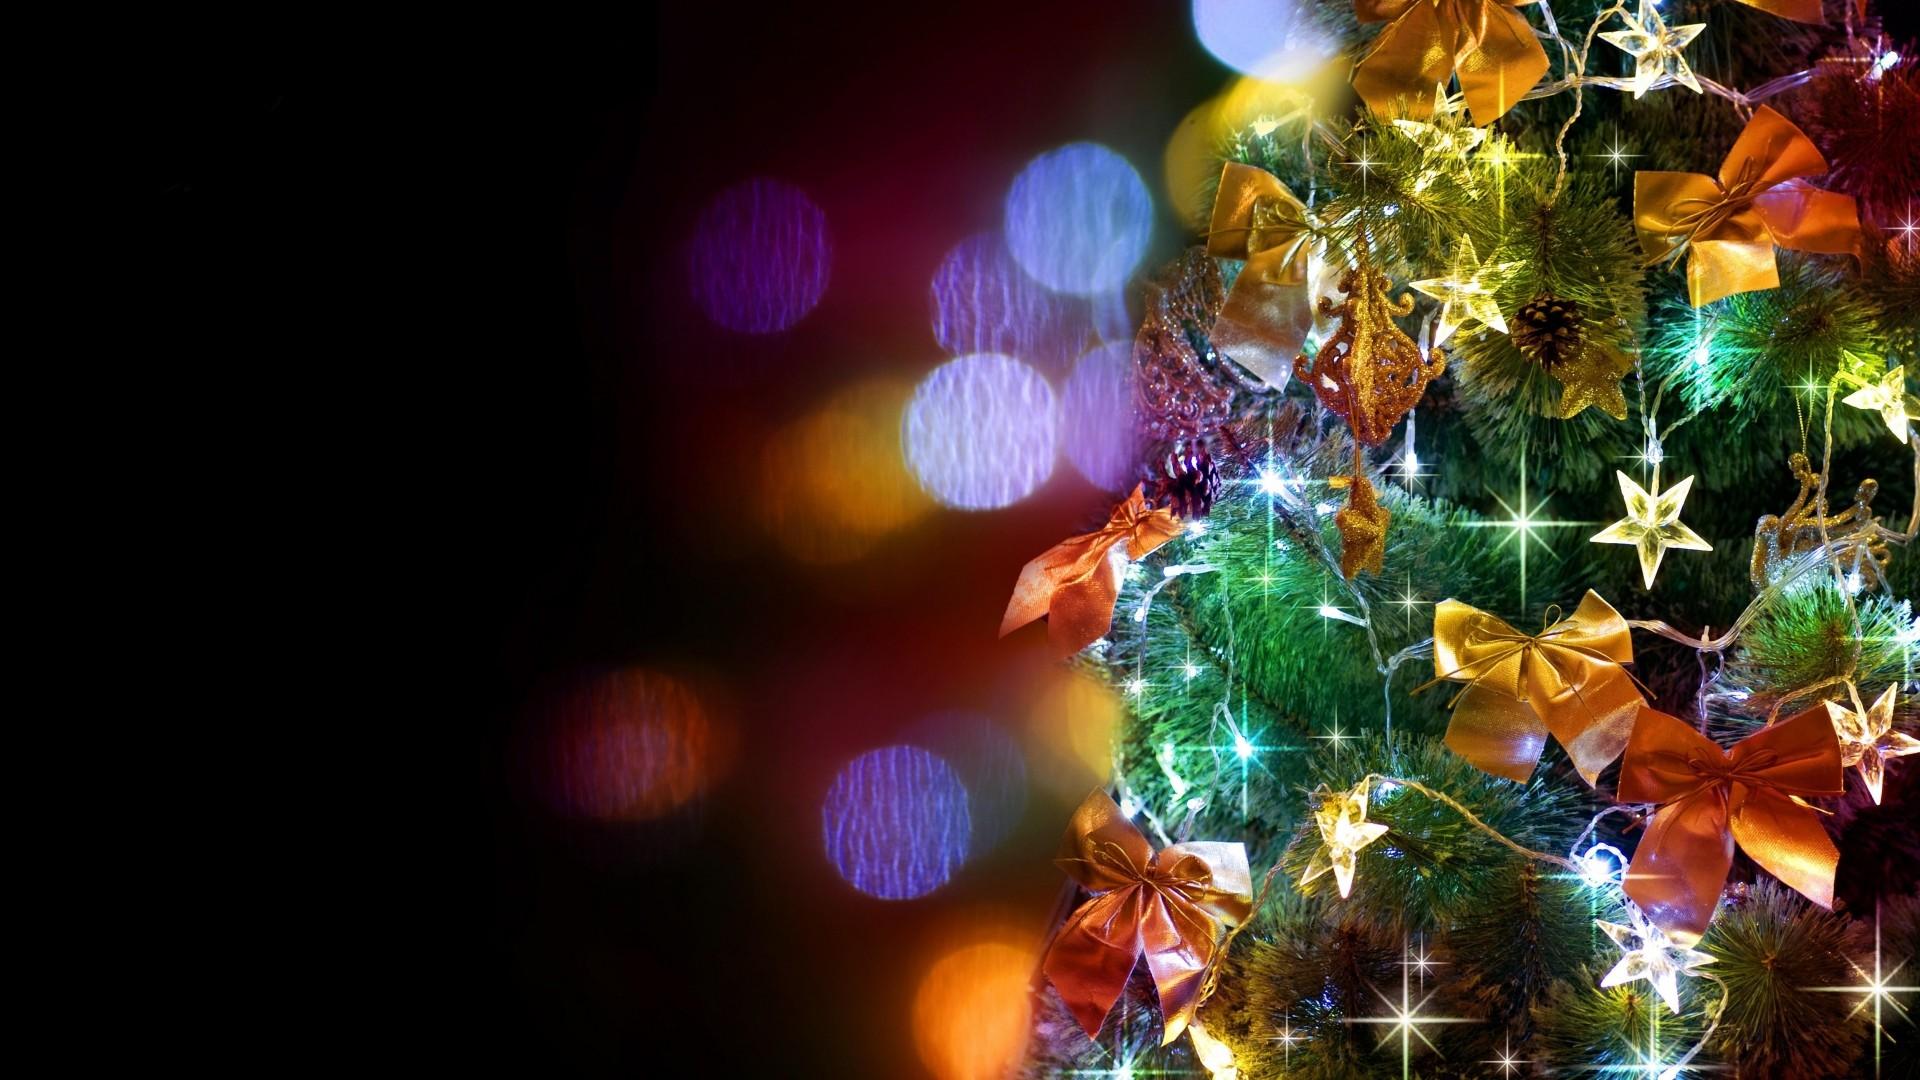 … christmas tree, garlands, ornaments